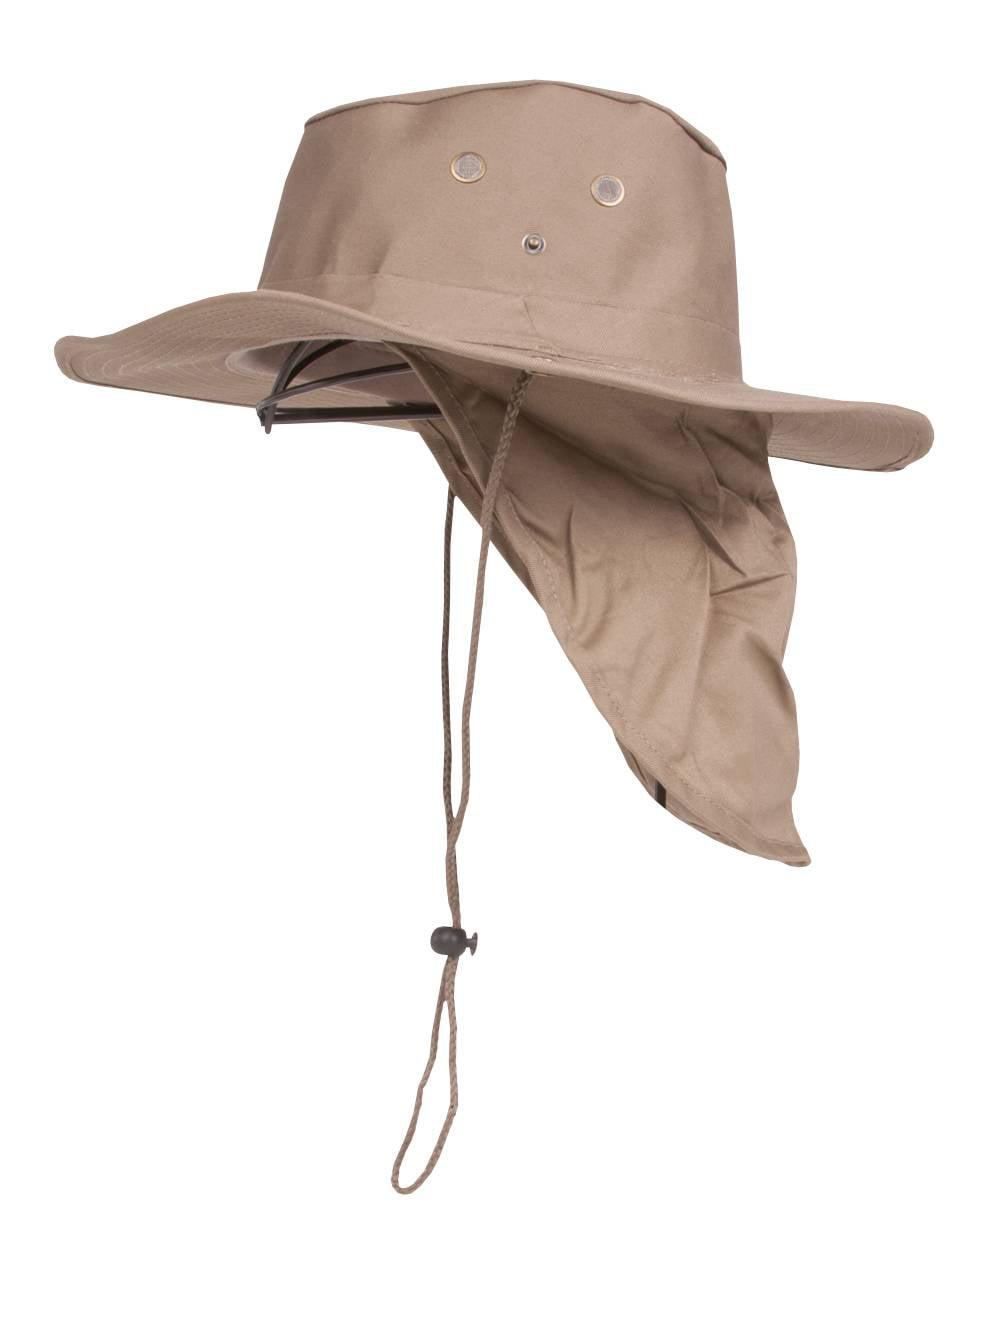 The American Outdoorsman Explorer Talon UV Bucket w//Flaps